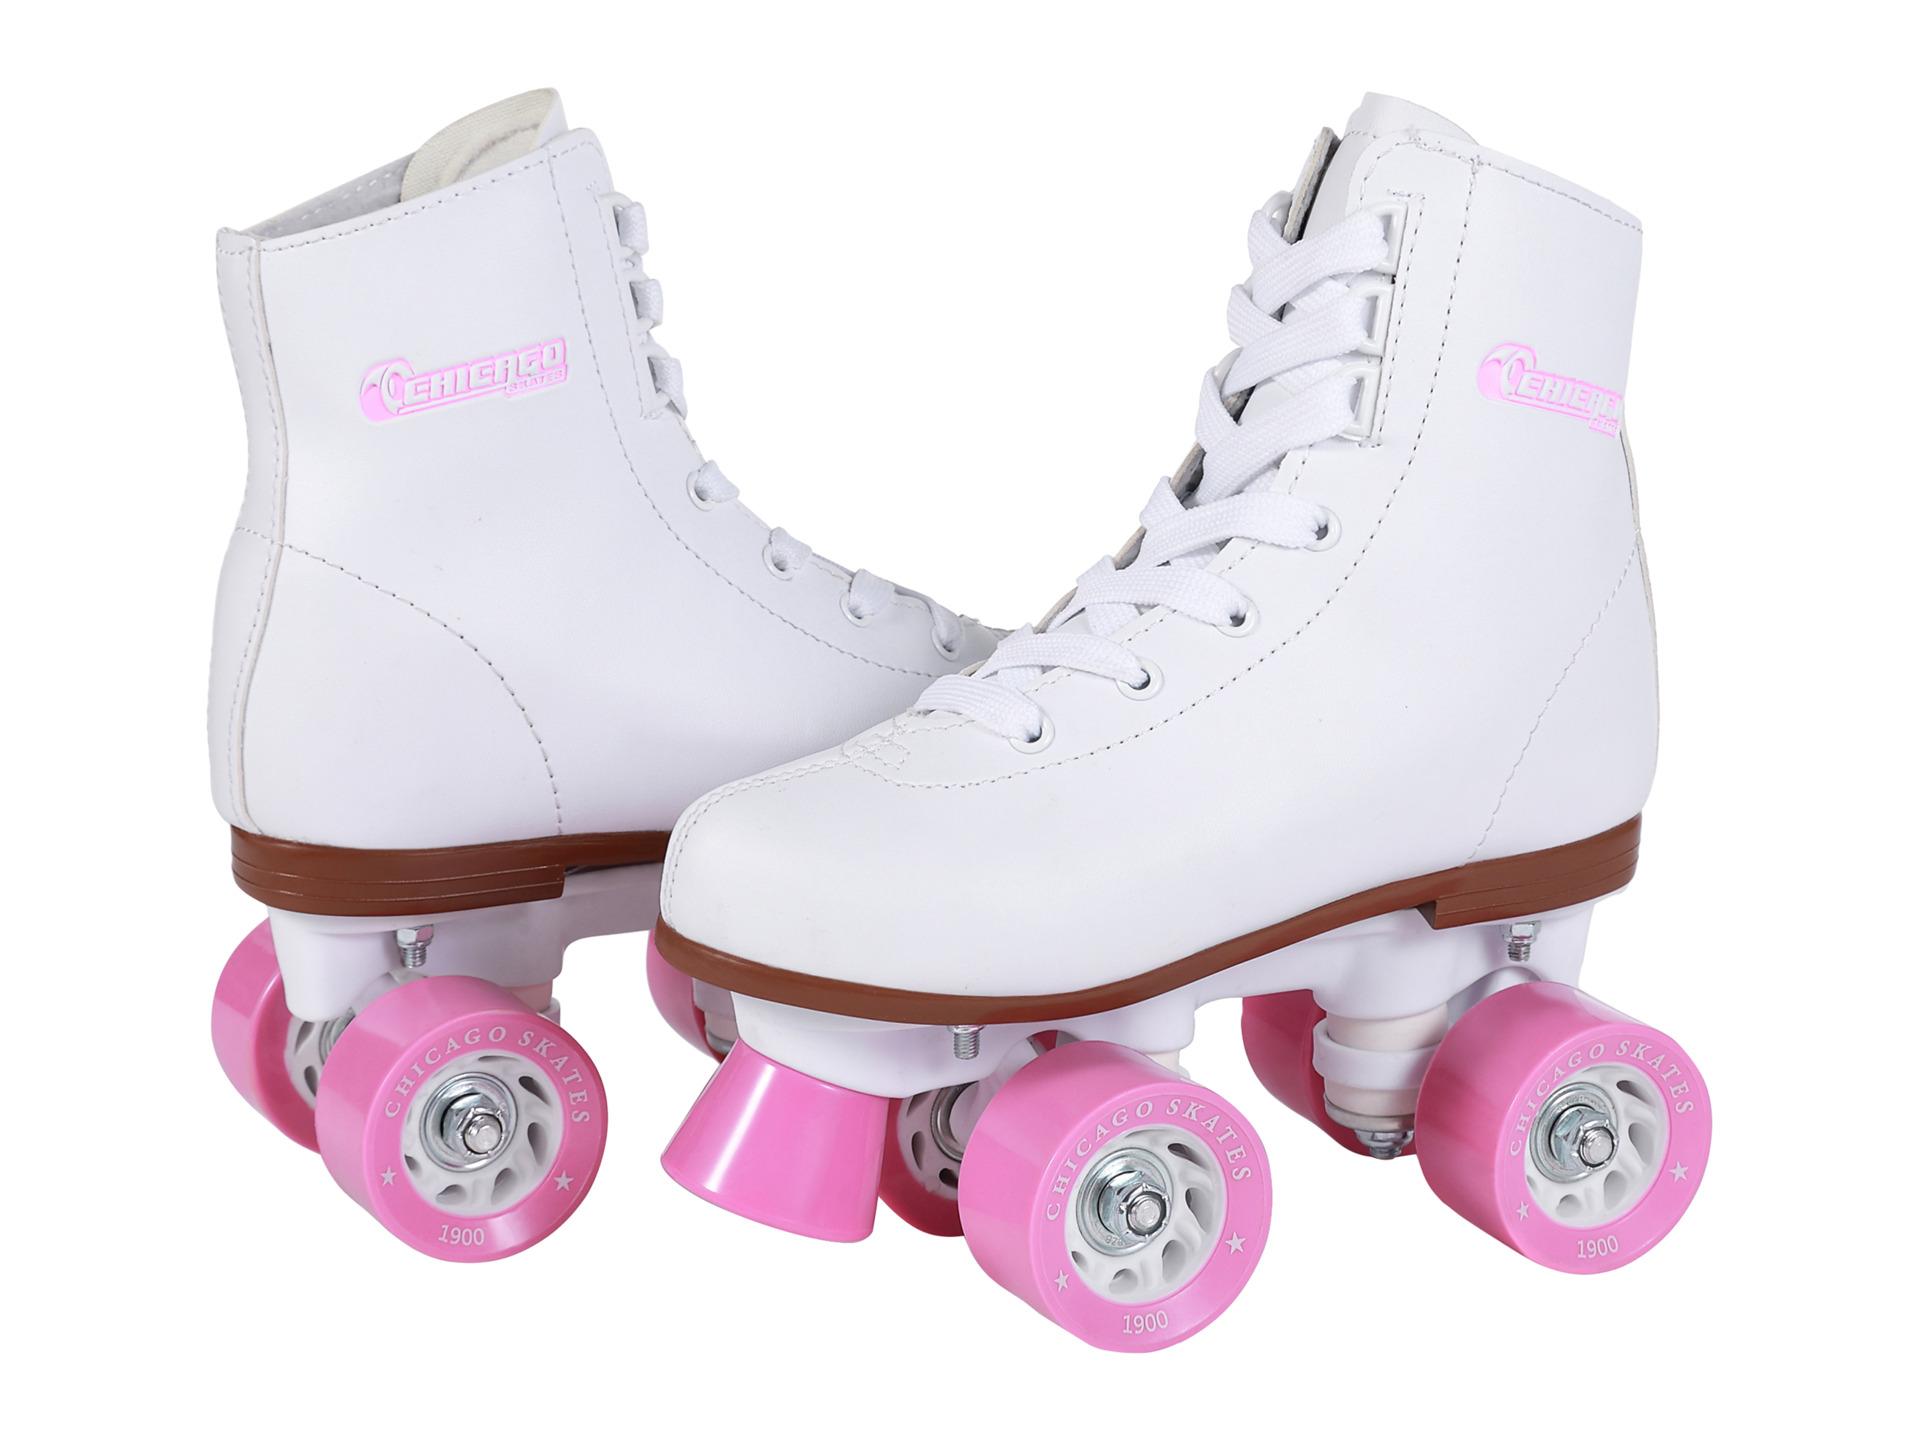 preschool skates chicago skates youth rink skate toddler kid big 560